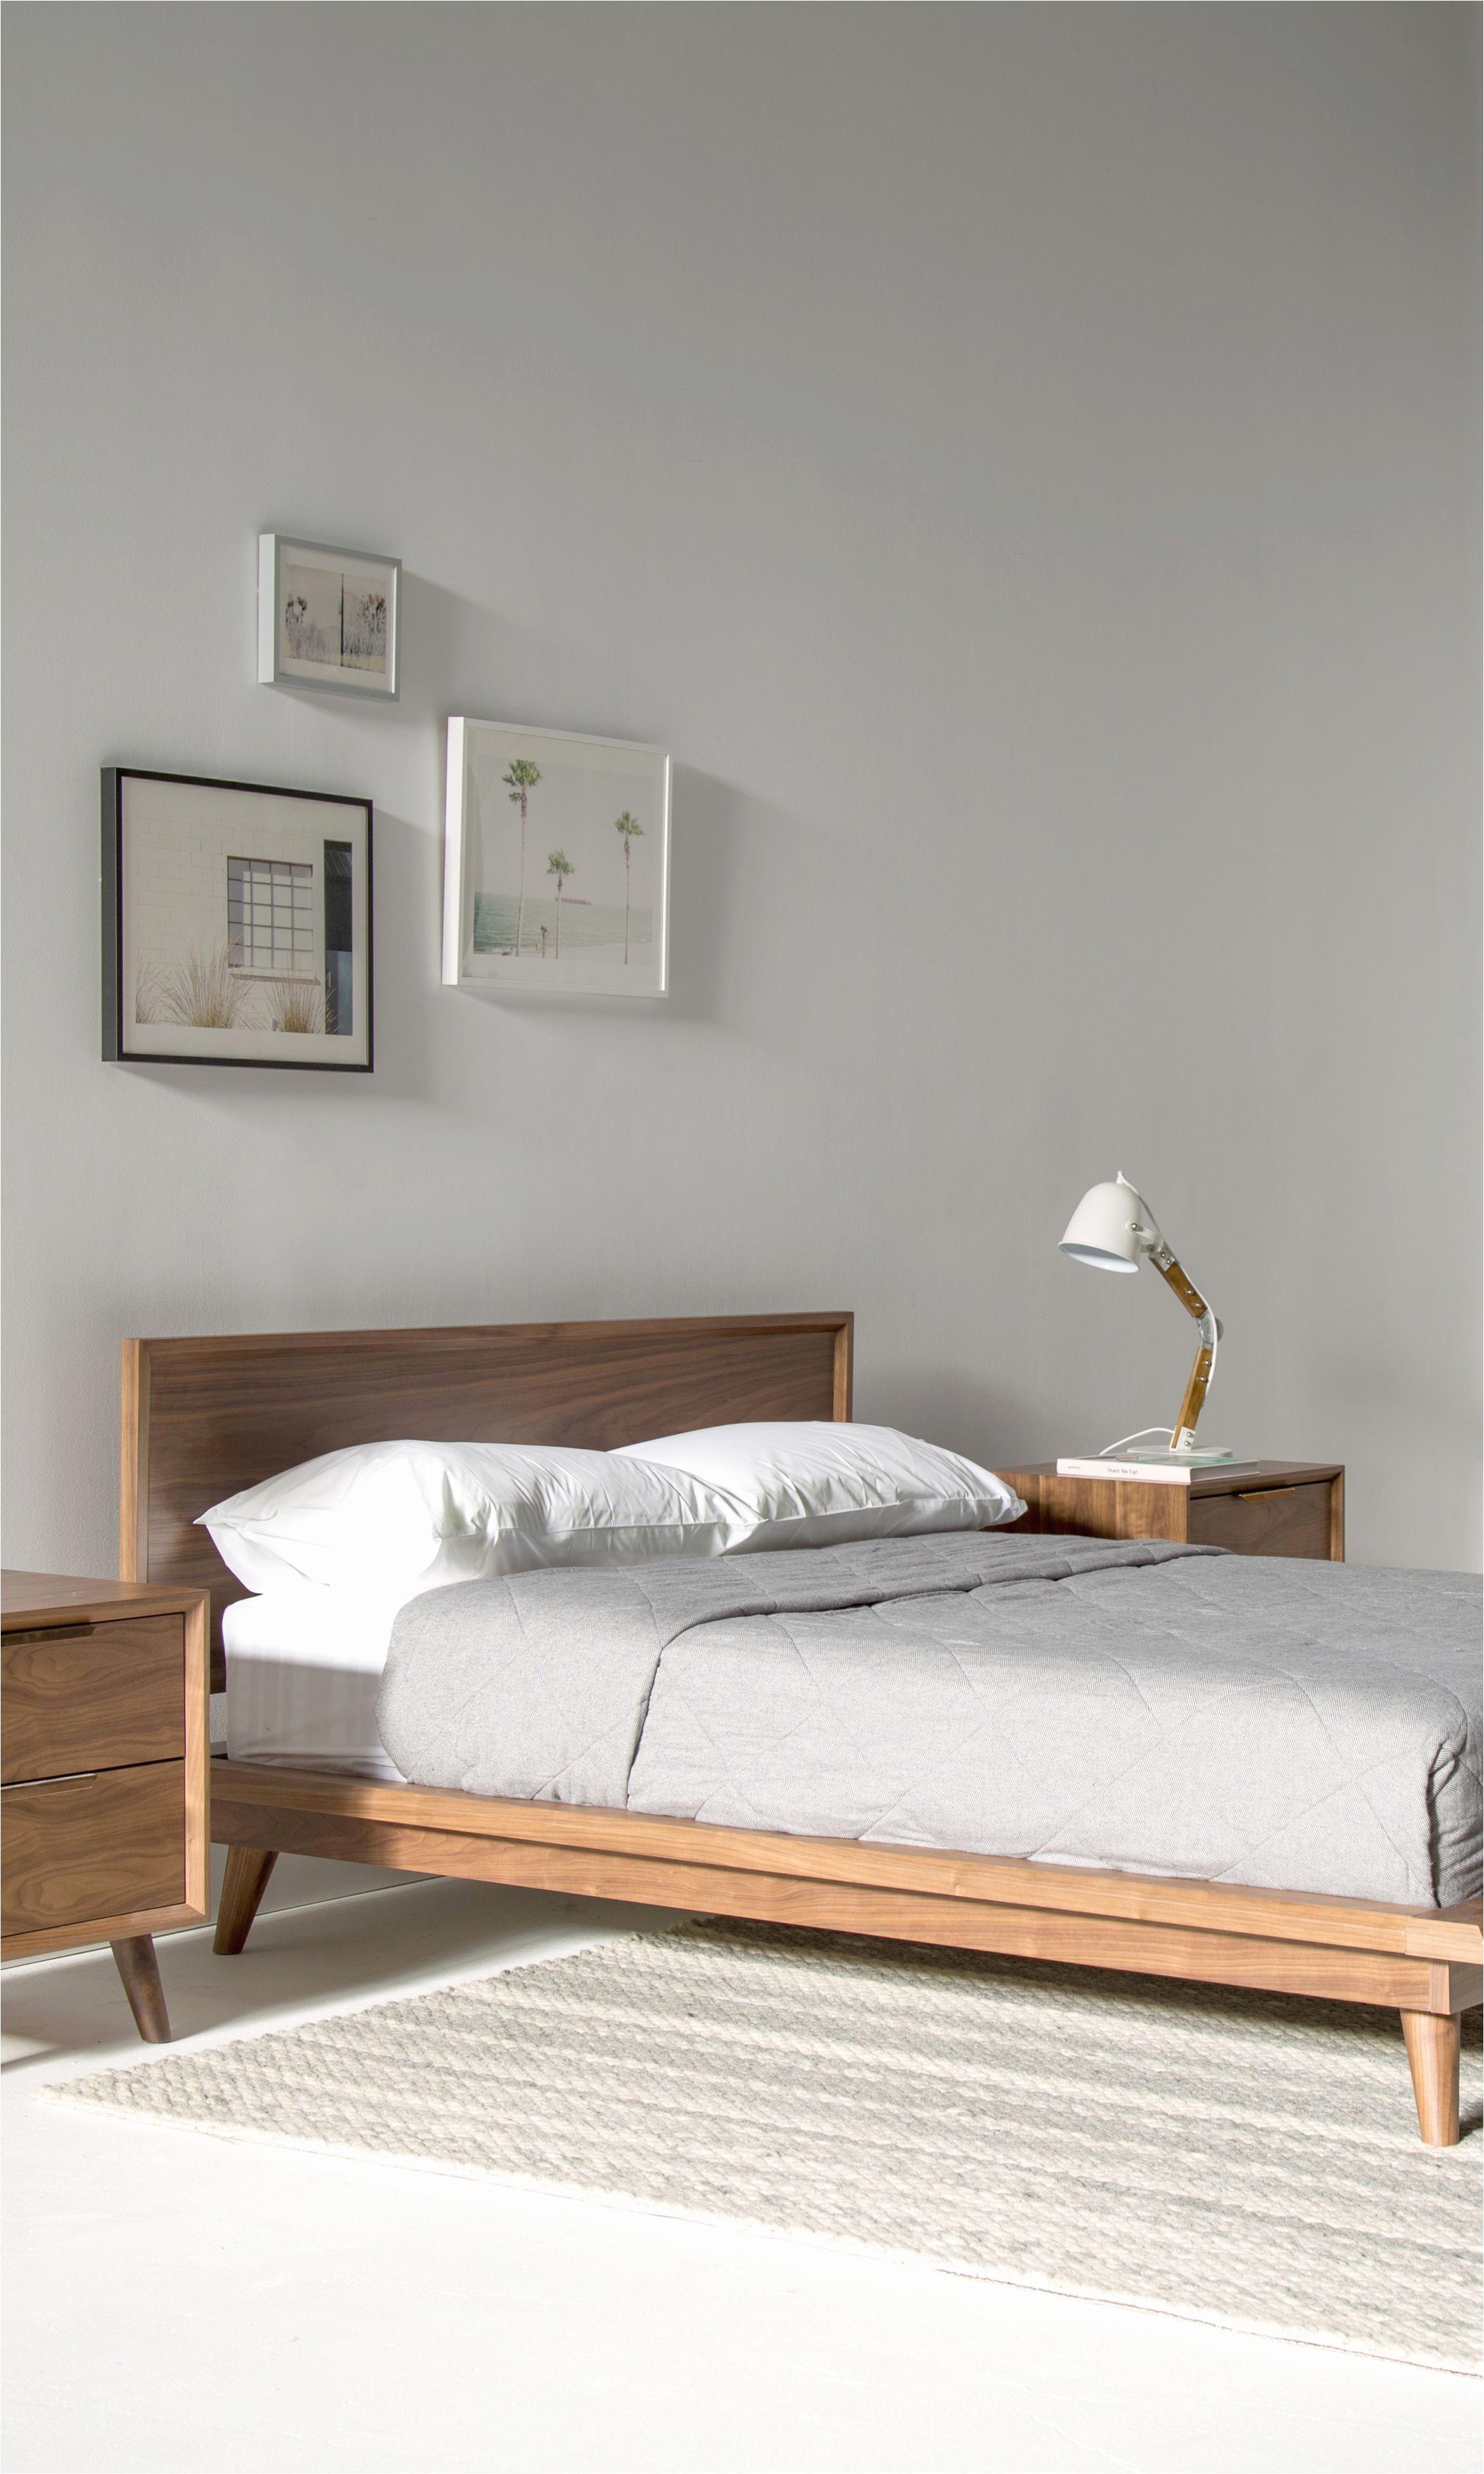 furniture stores minocqua wi unique wall decals for bedroom unique 1 kirkland wall decor home design